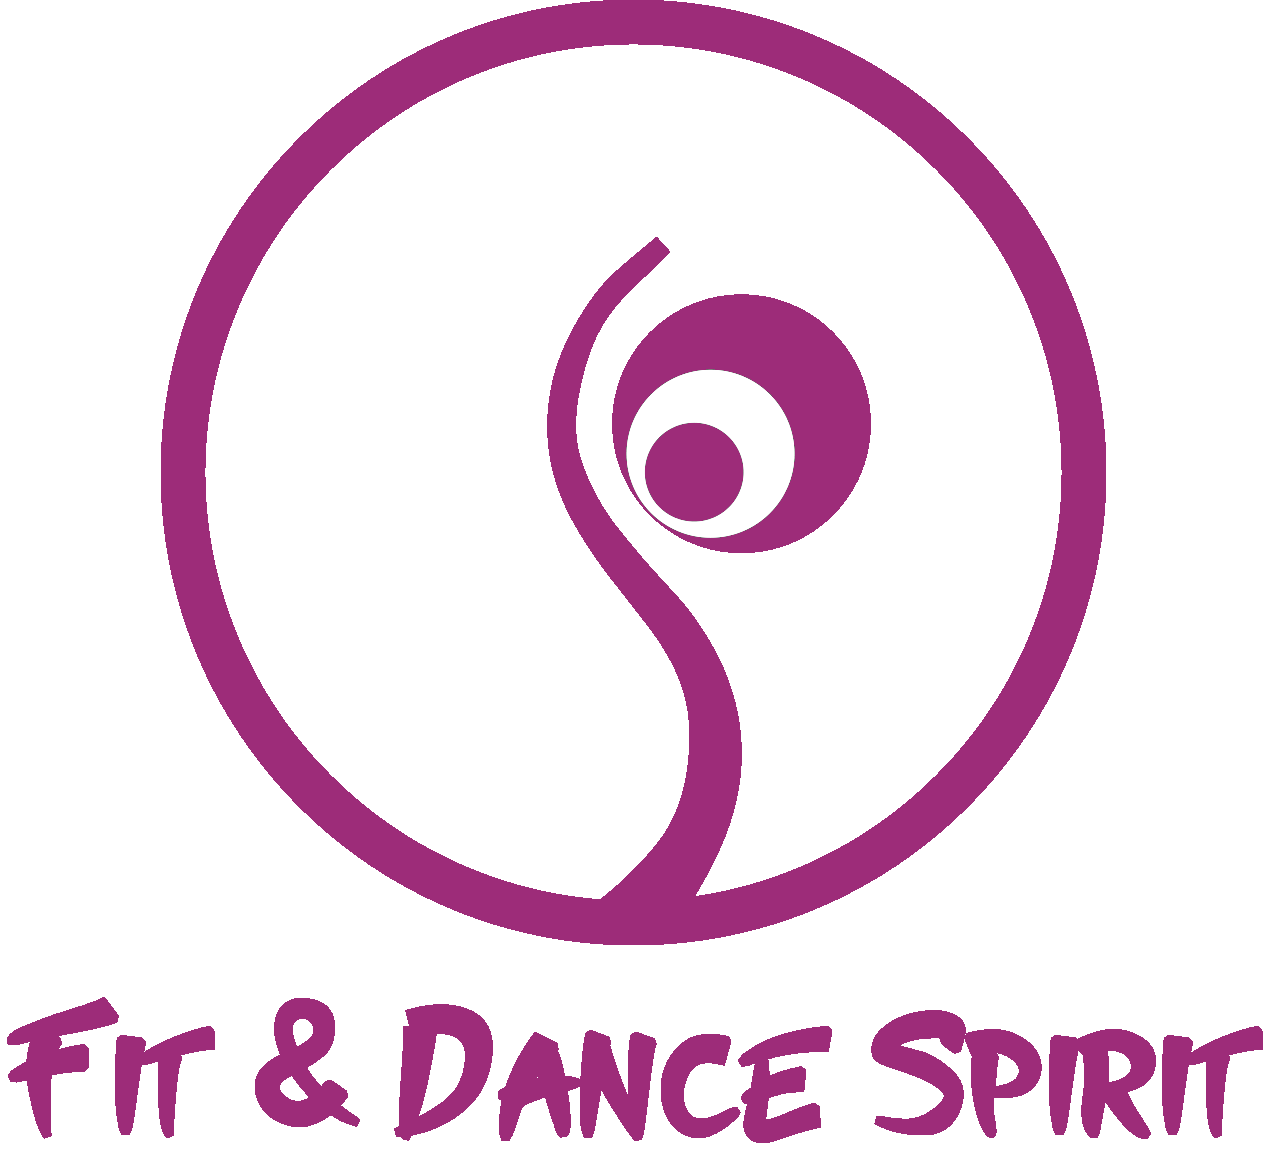 Fit & Dance Spirit